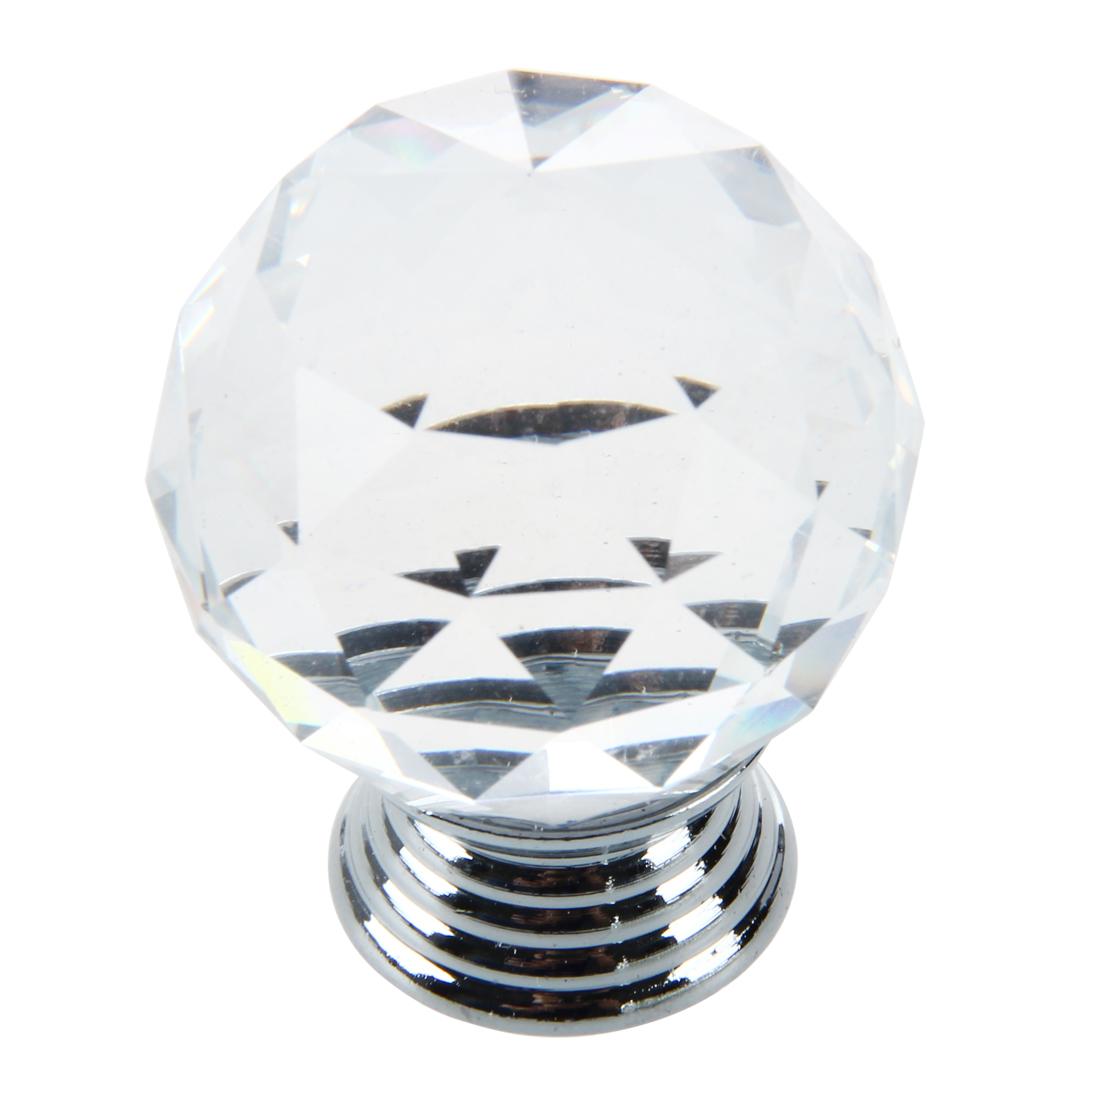 glass crystal door knobs photo - 15